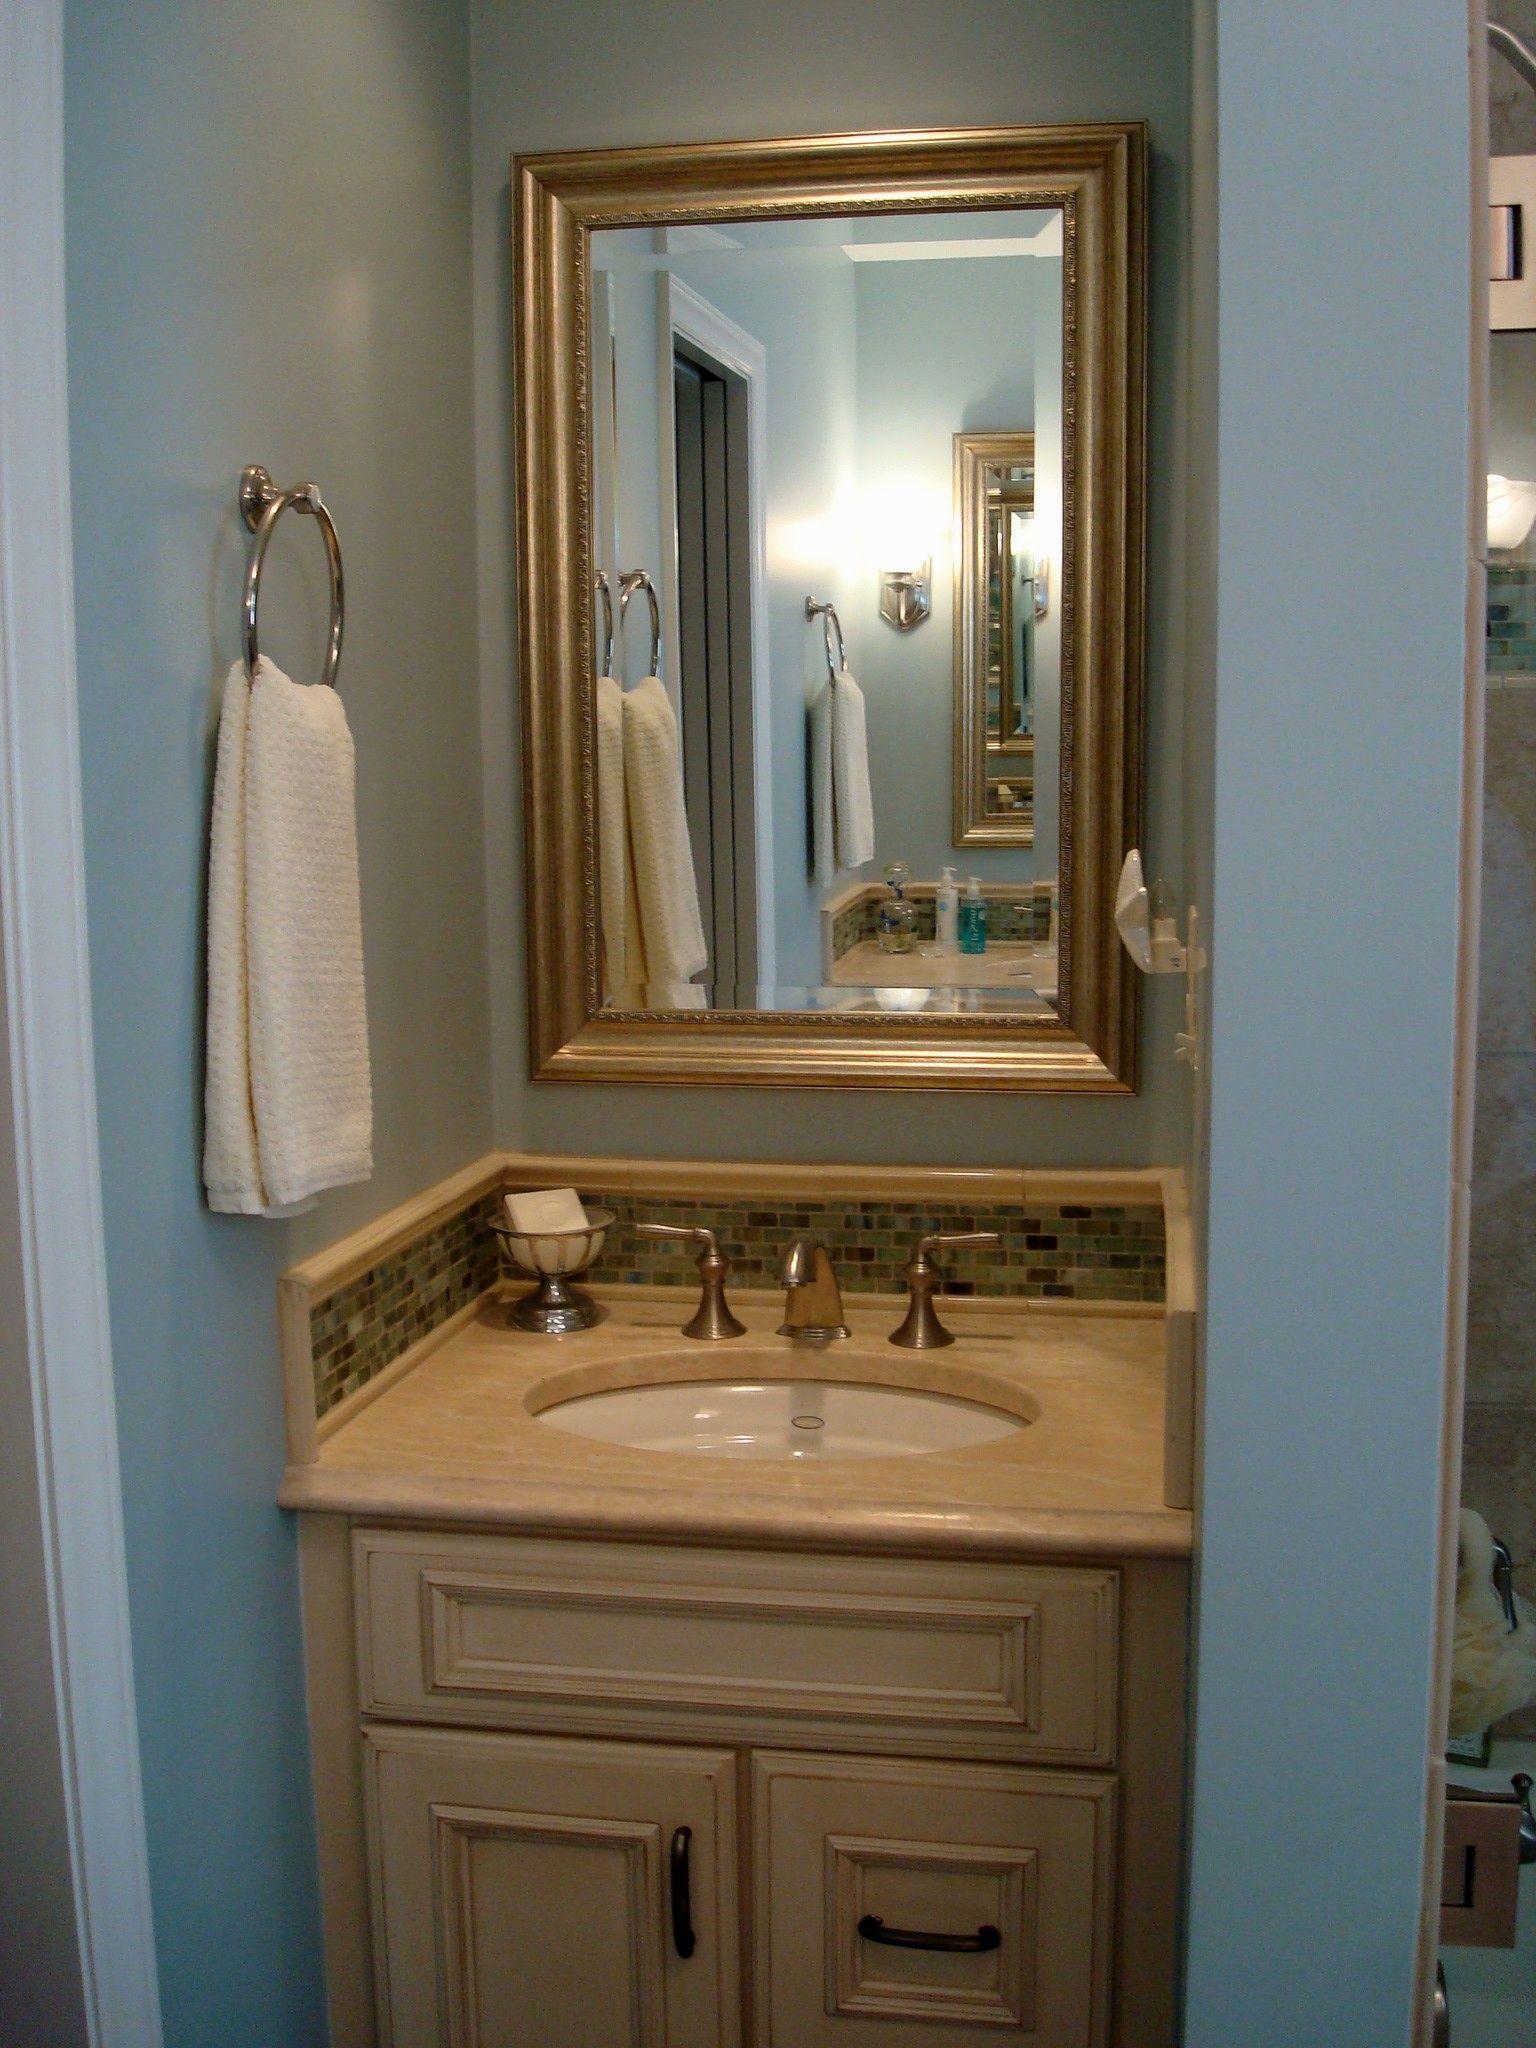 Free Bathroom Design Tool Ipad